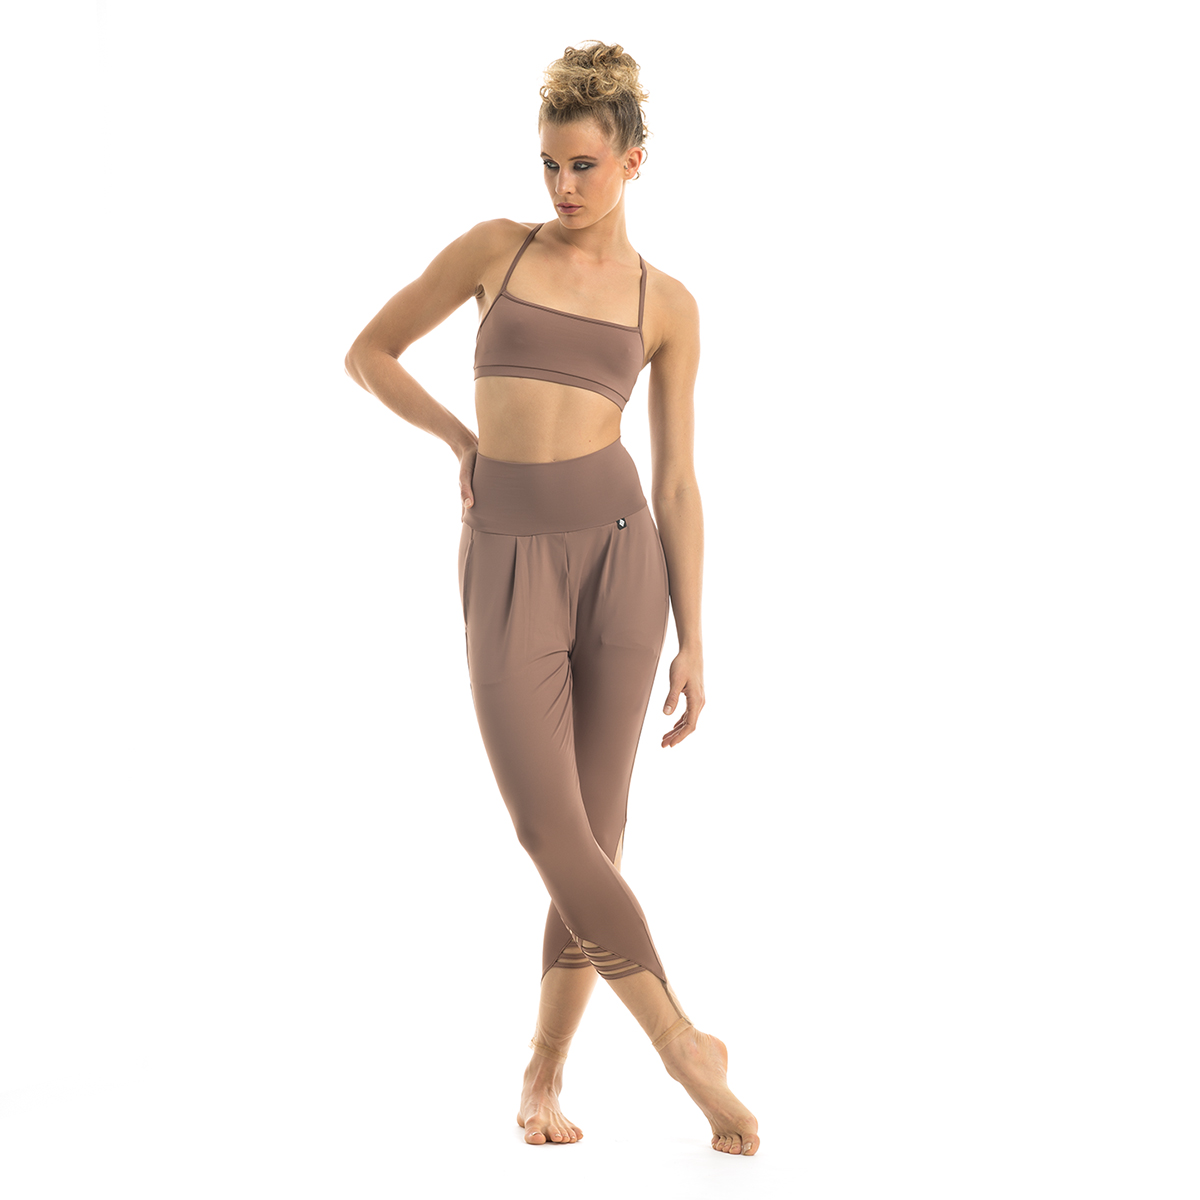 slim-warm-up-pants-nude-no2-set-front.jpg